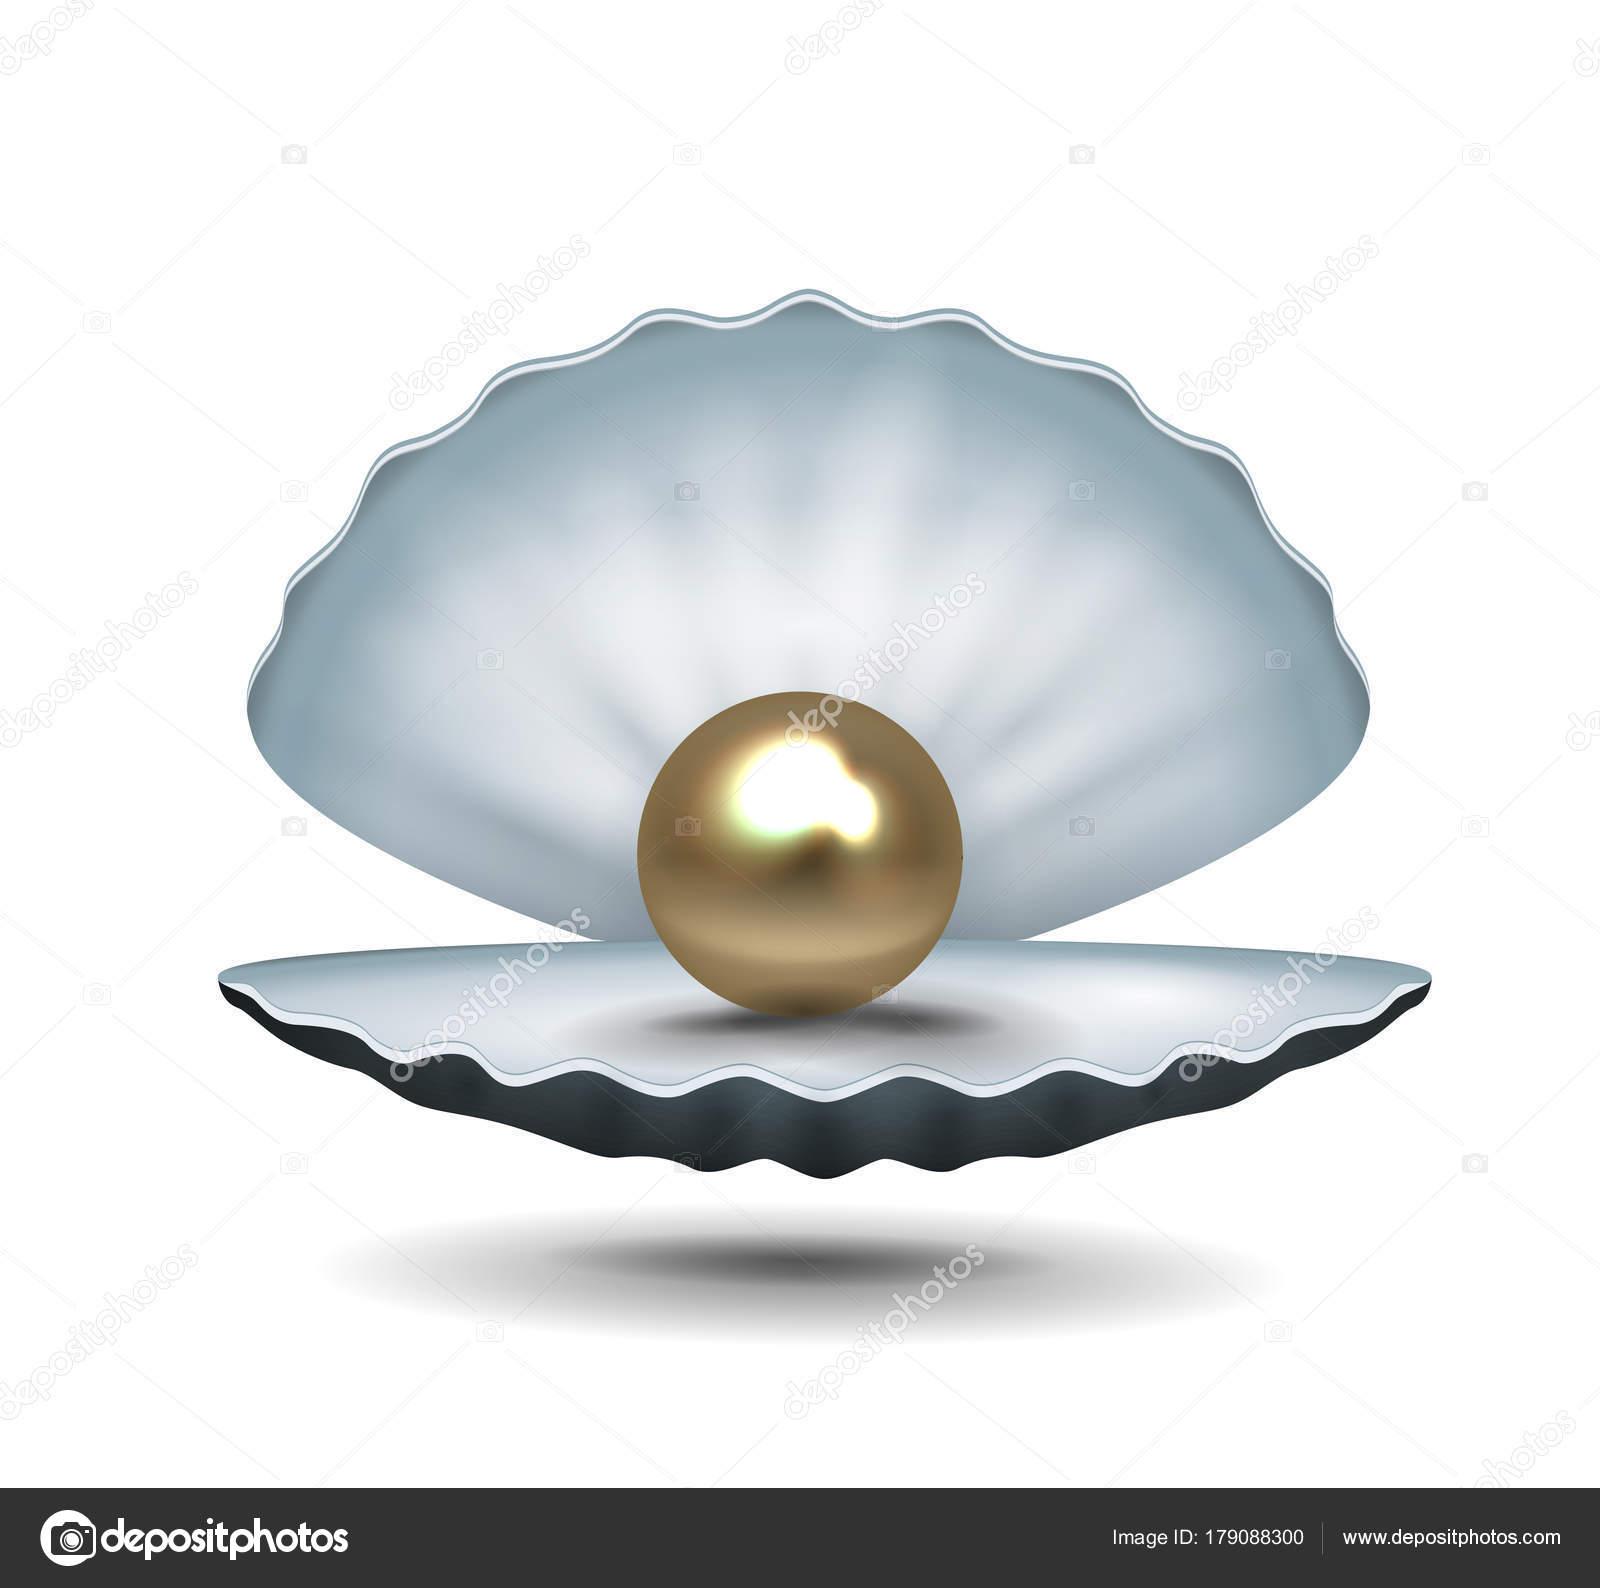 Euro Pearl Shell — Stock Vector © kosecki #179088300